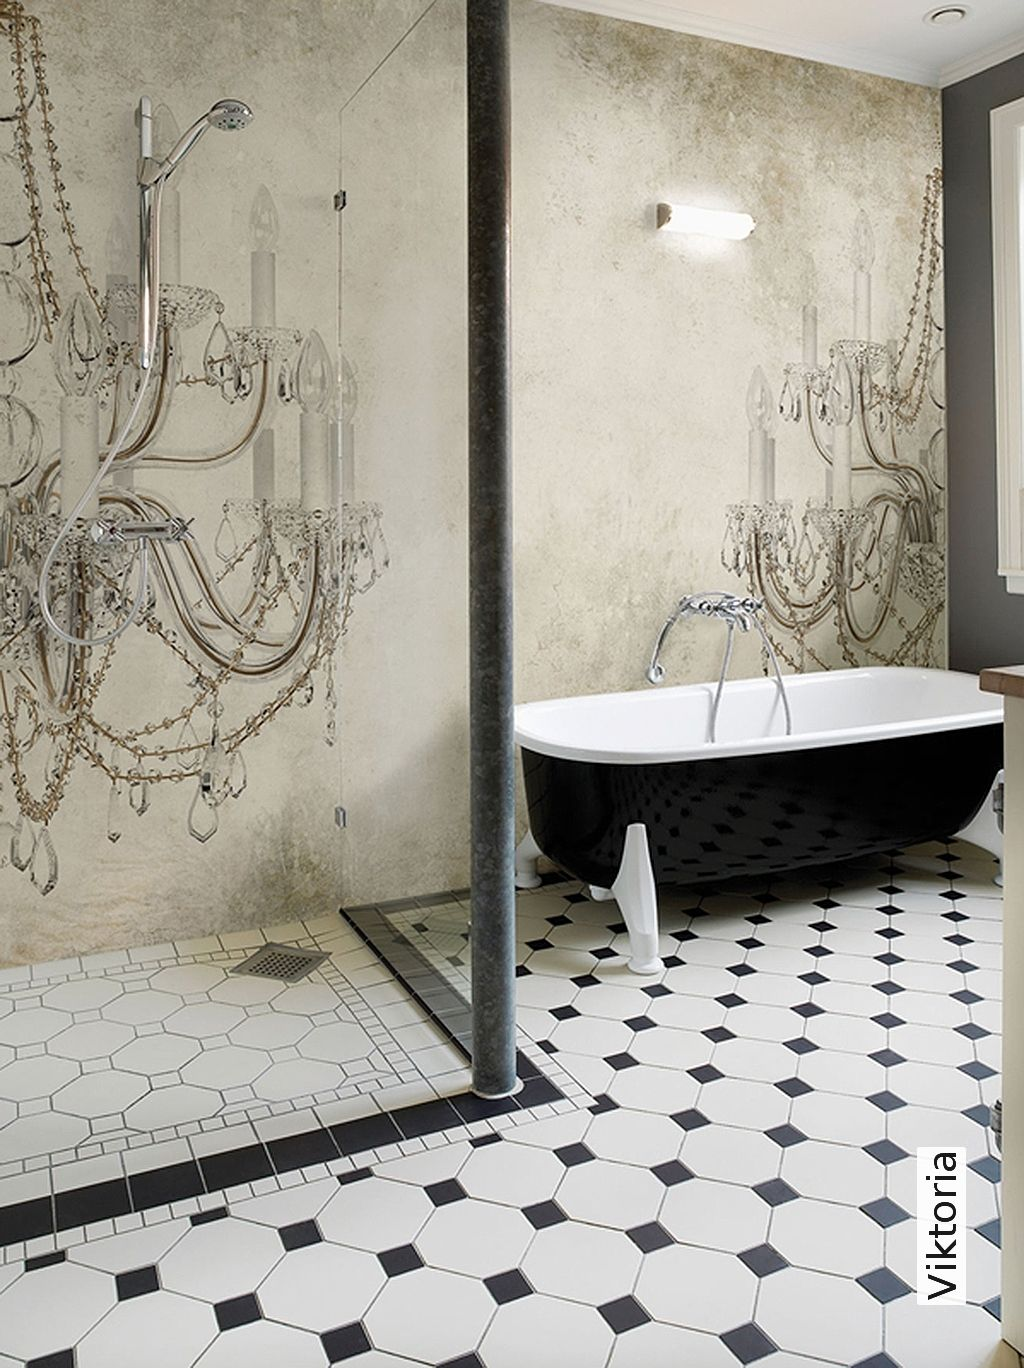 Viktoria | Tapete im Badezimmer | Pinterest | Tapeten, Bad und ...